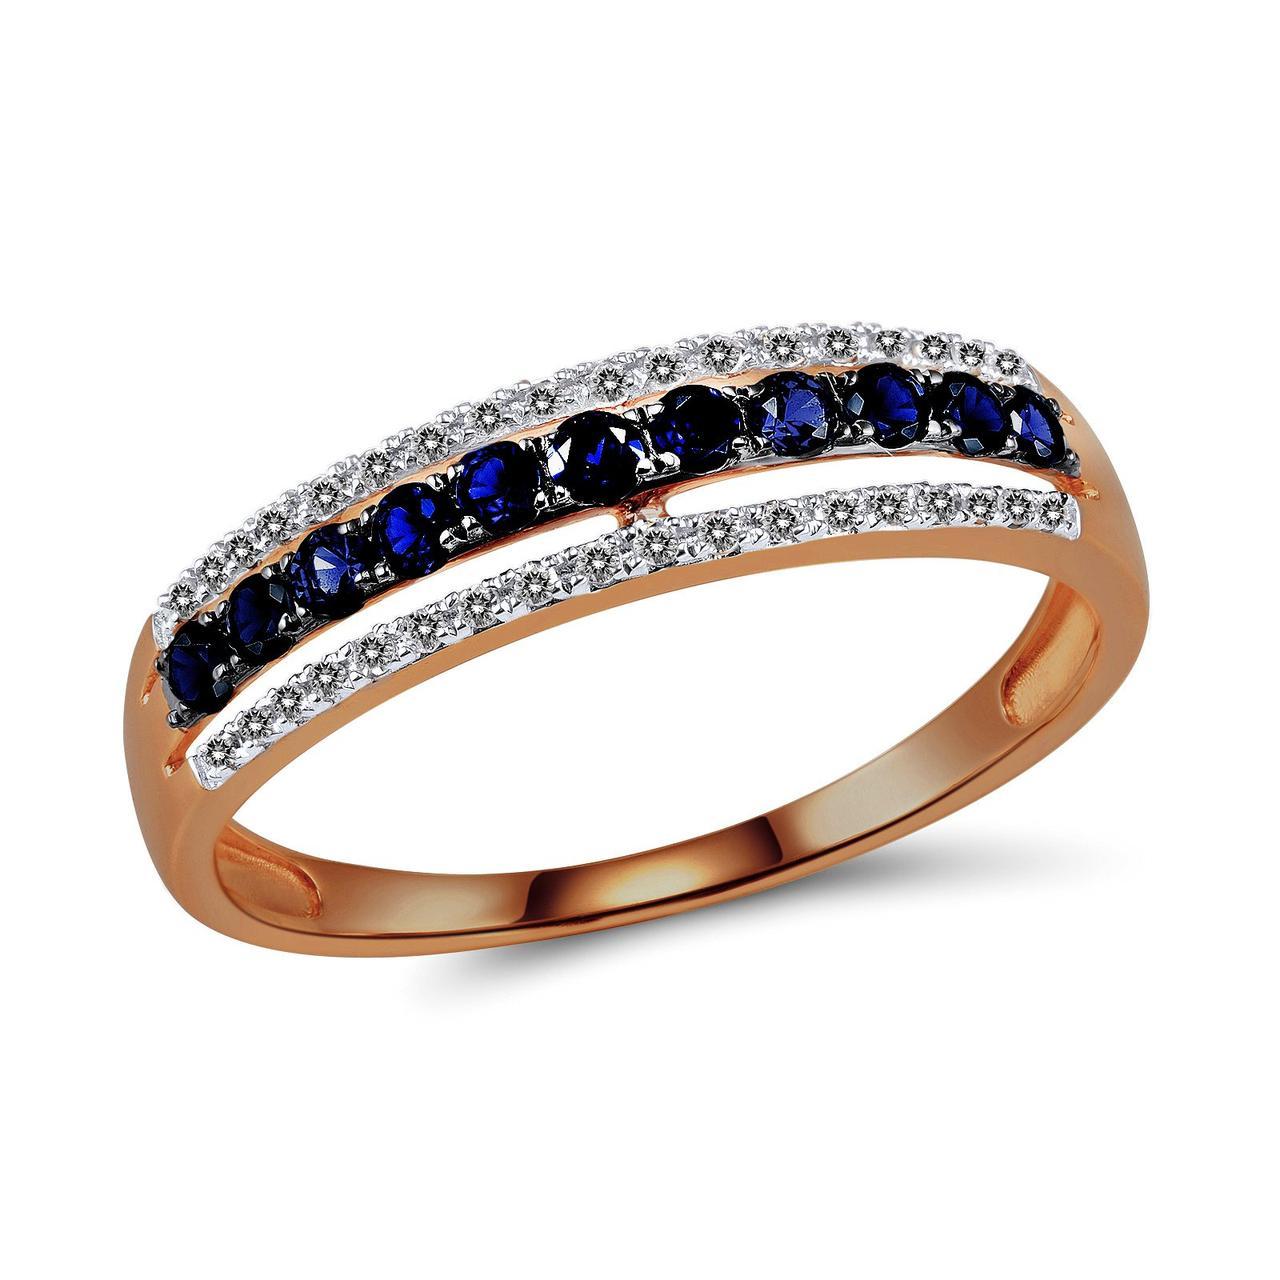 Золотое кольцо с бриллиантами и сапфирами, размер 16.5 (561111)